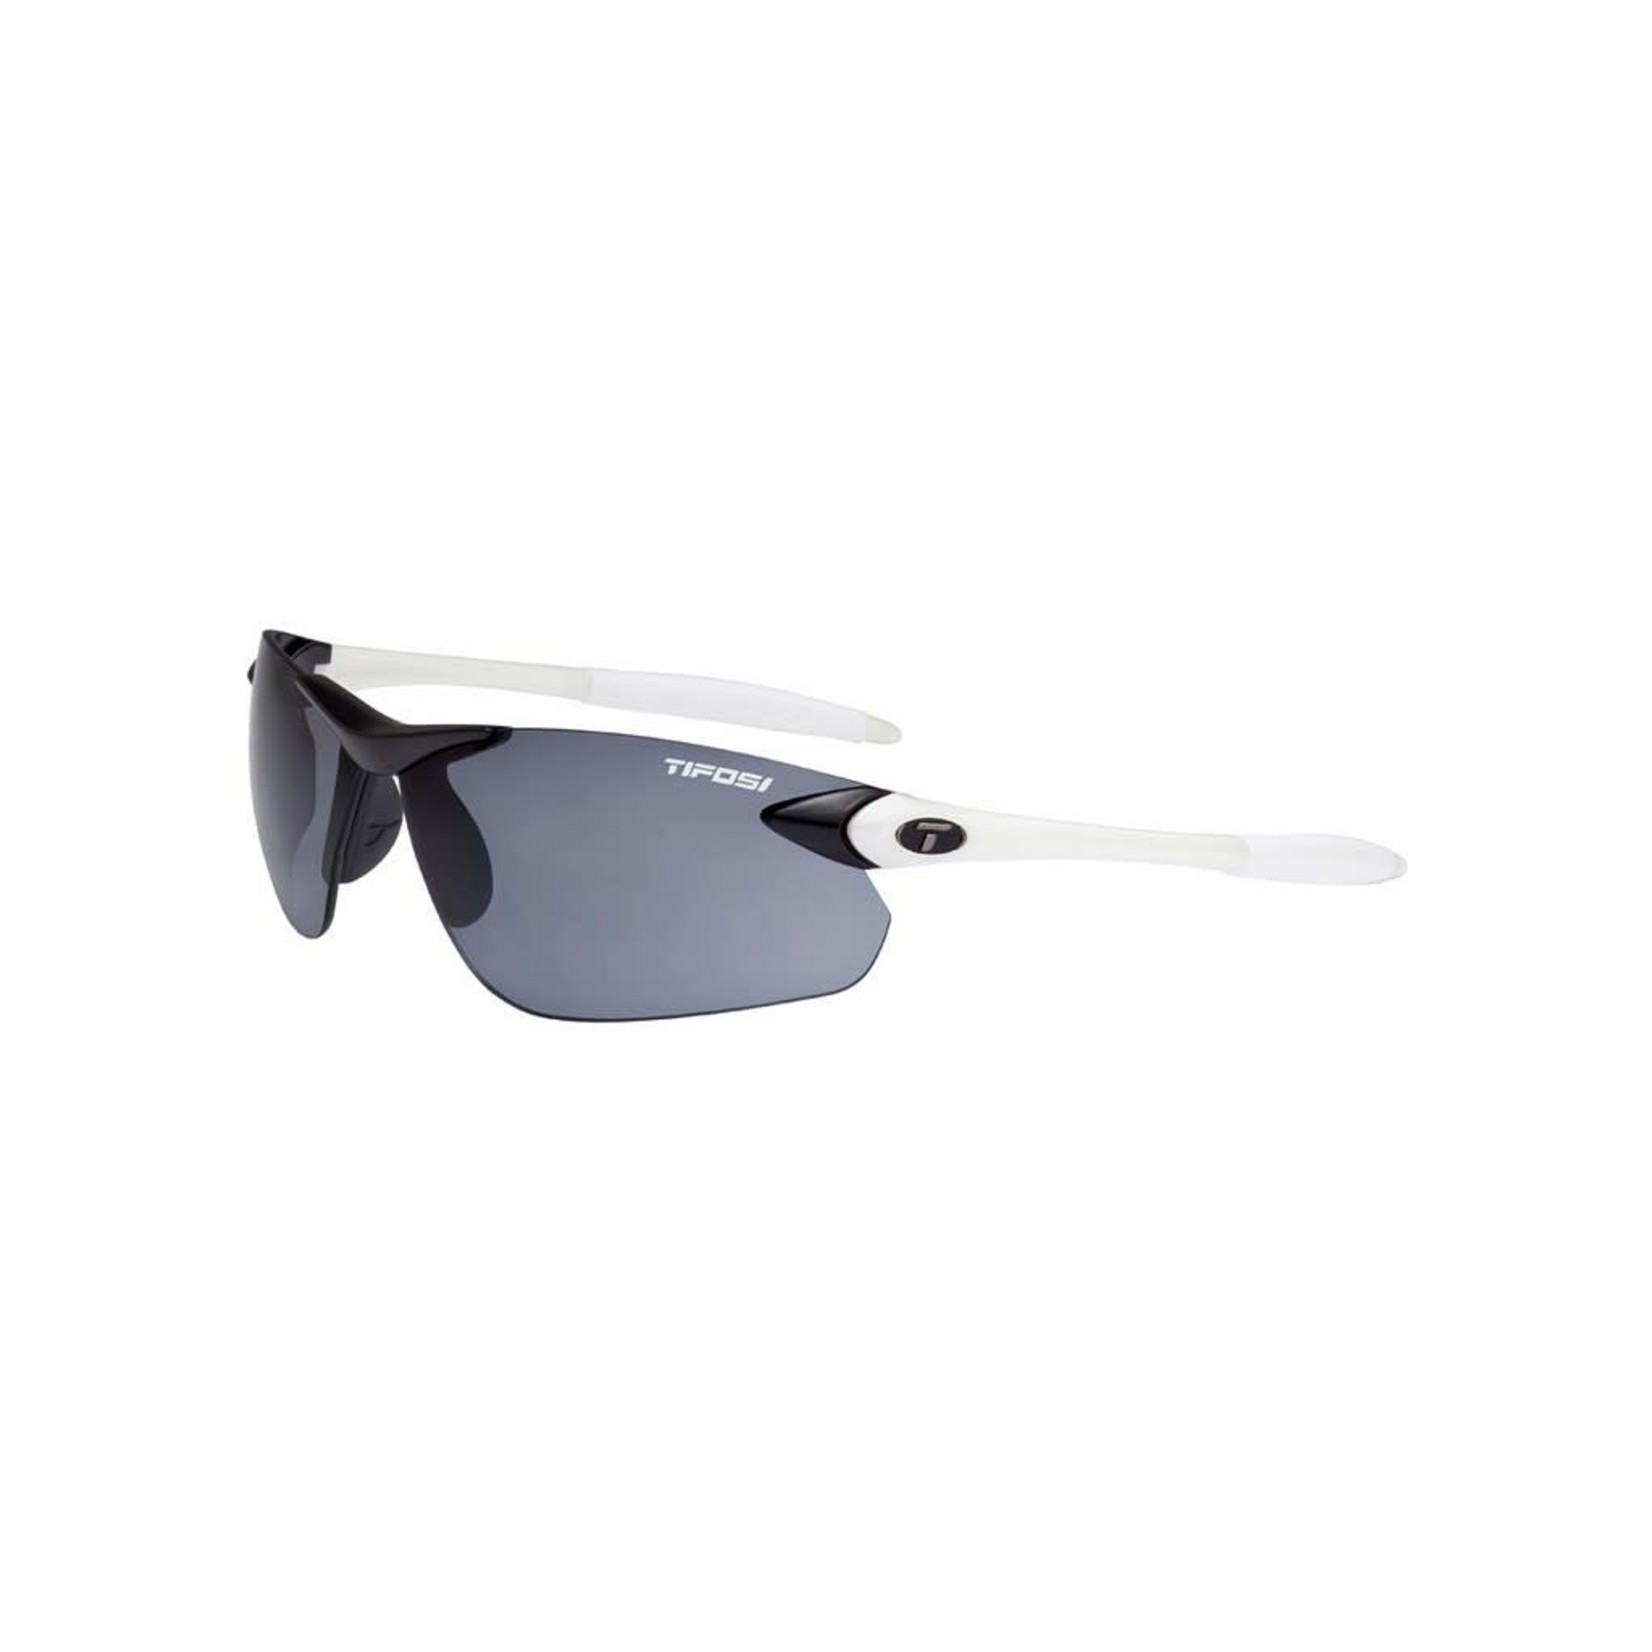 TIFOSI OPTICS Sunglasses Tifosi Seek FC White/Black